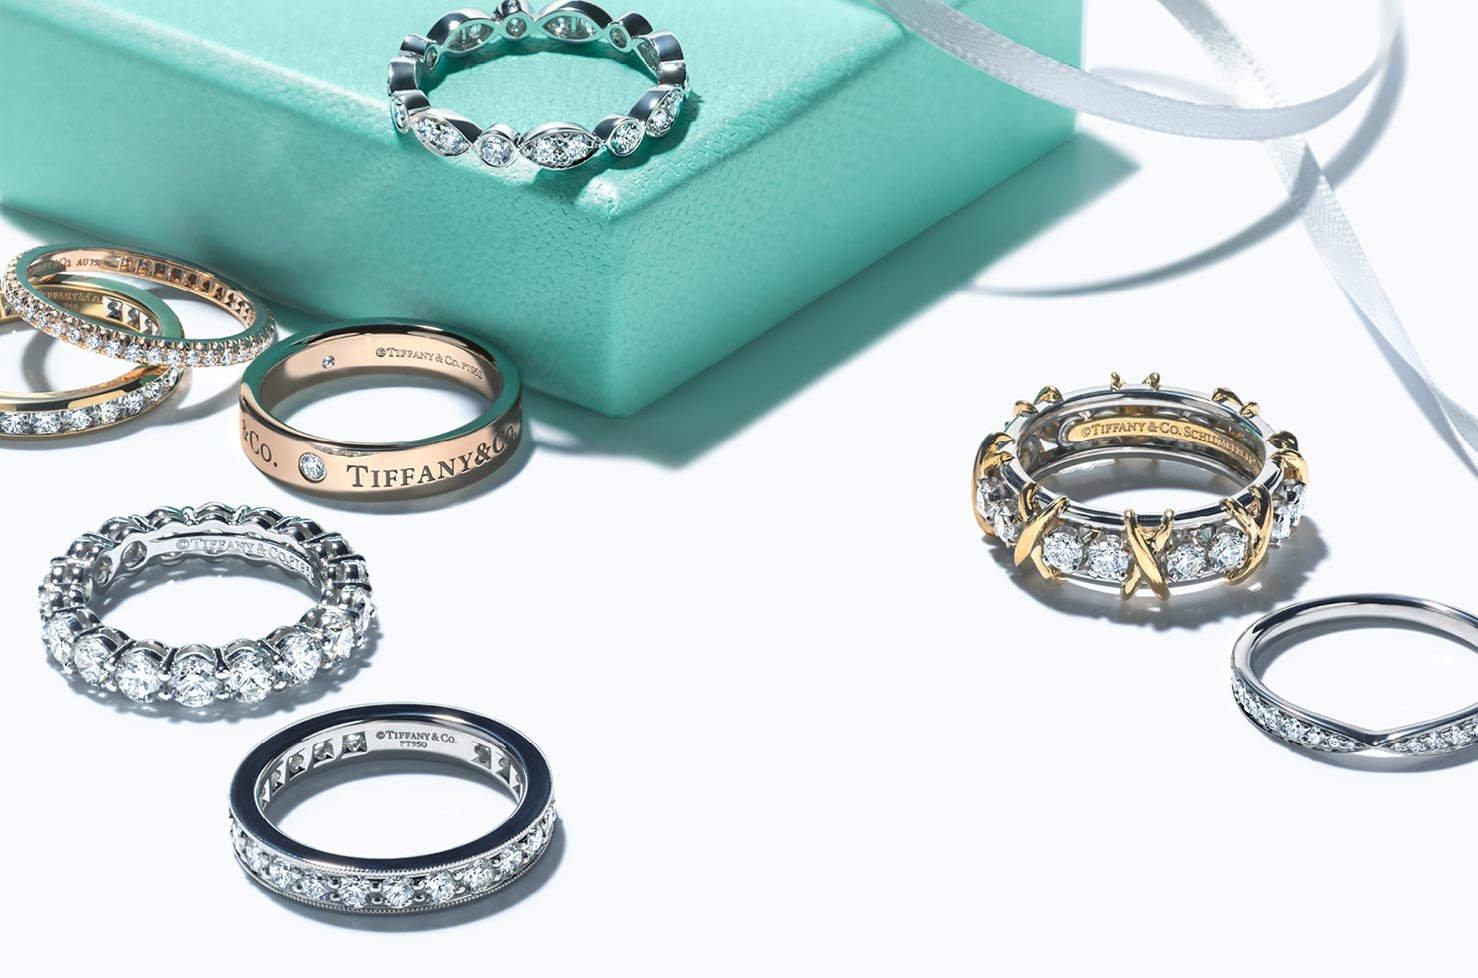 Tiffany & co wedding ring에 대한 이미지 검색결과